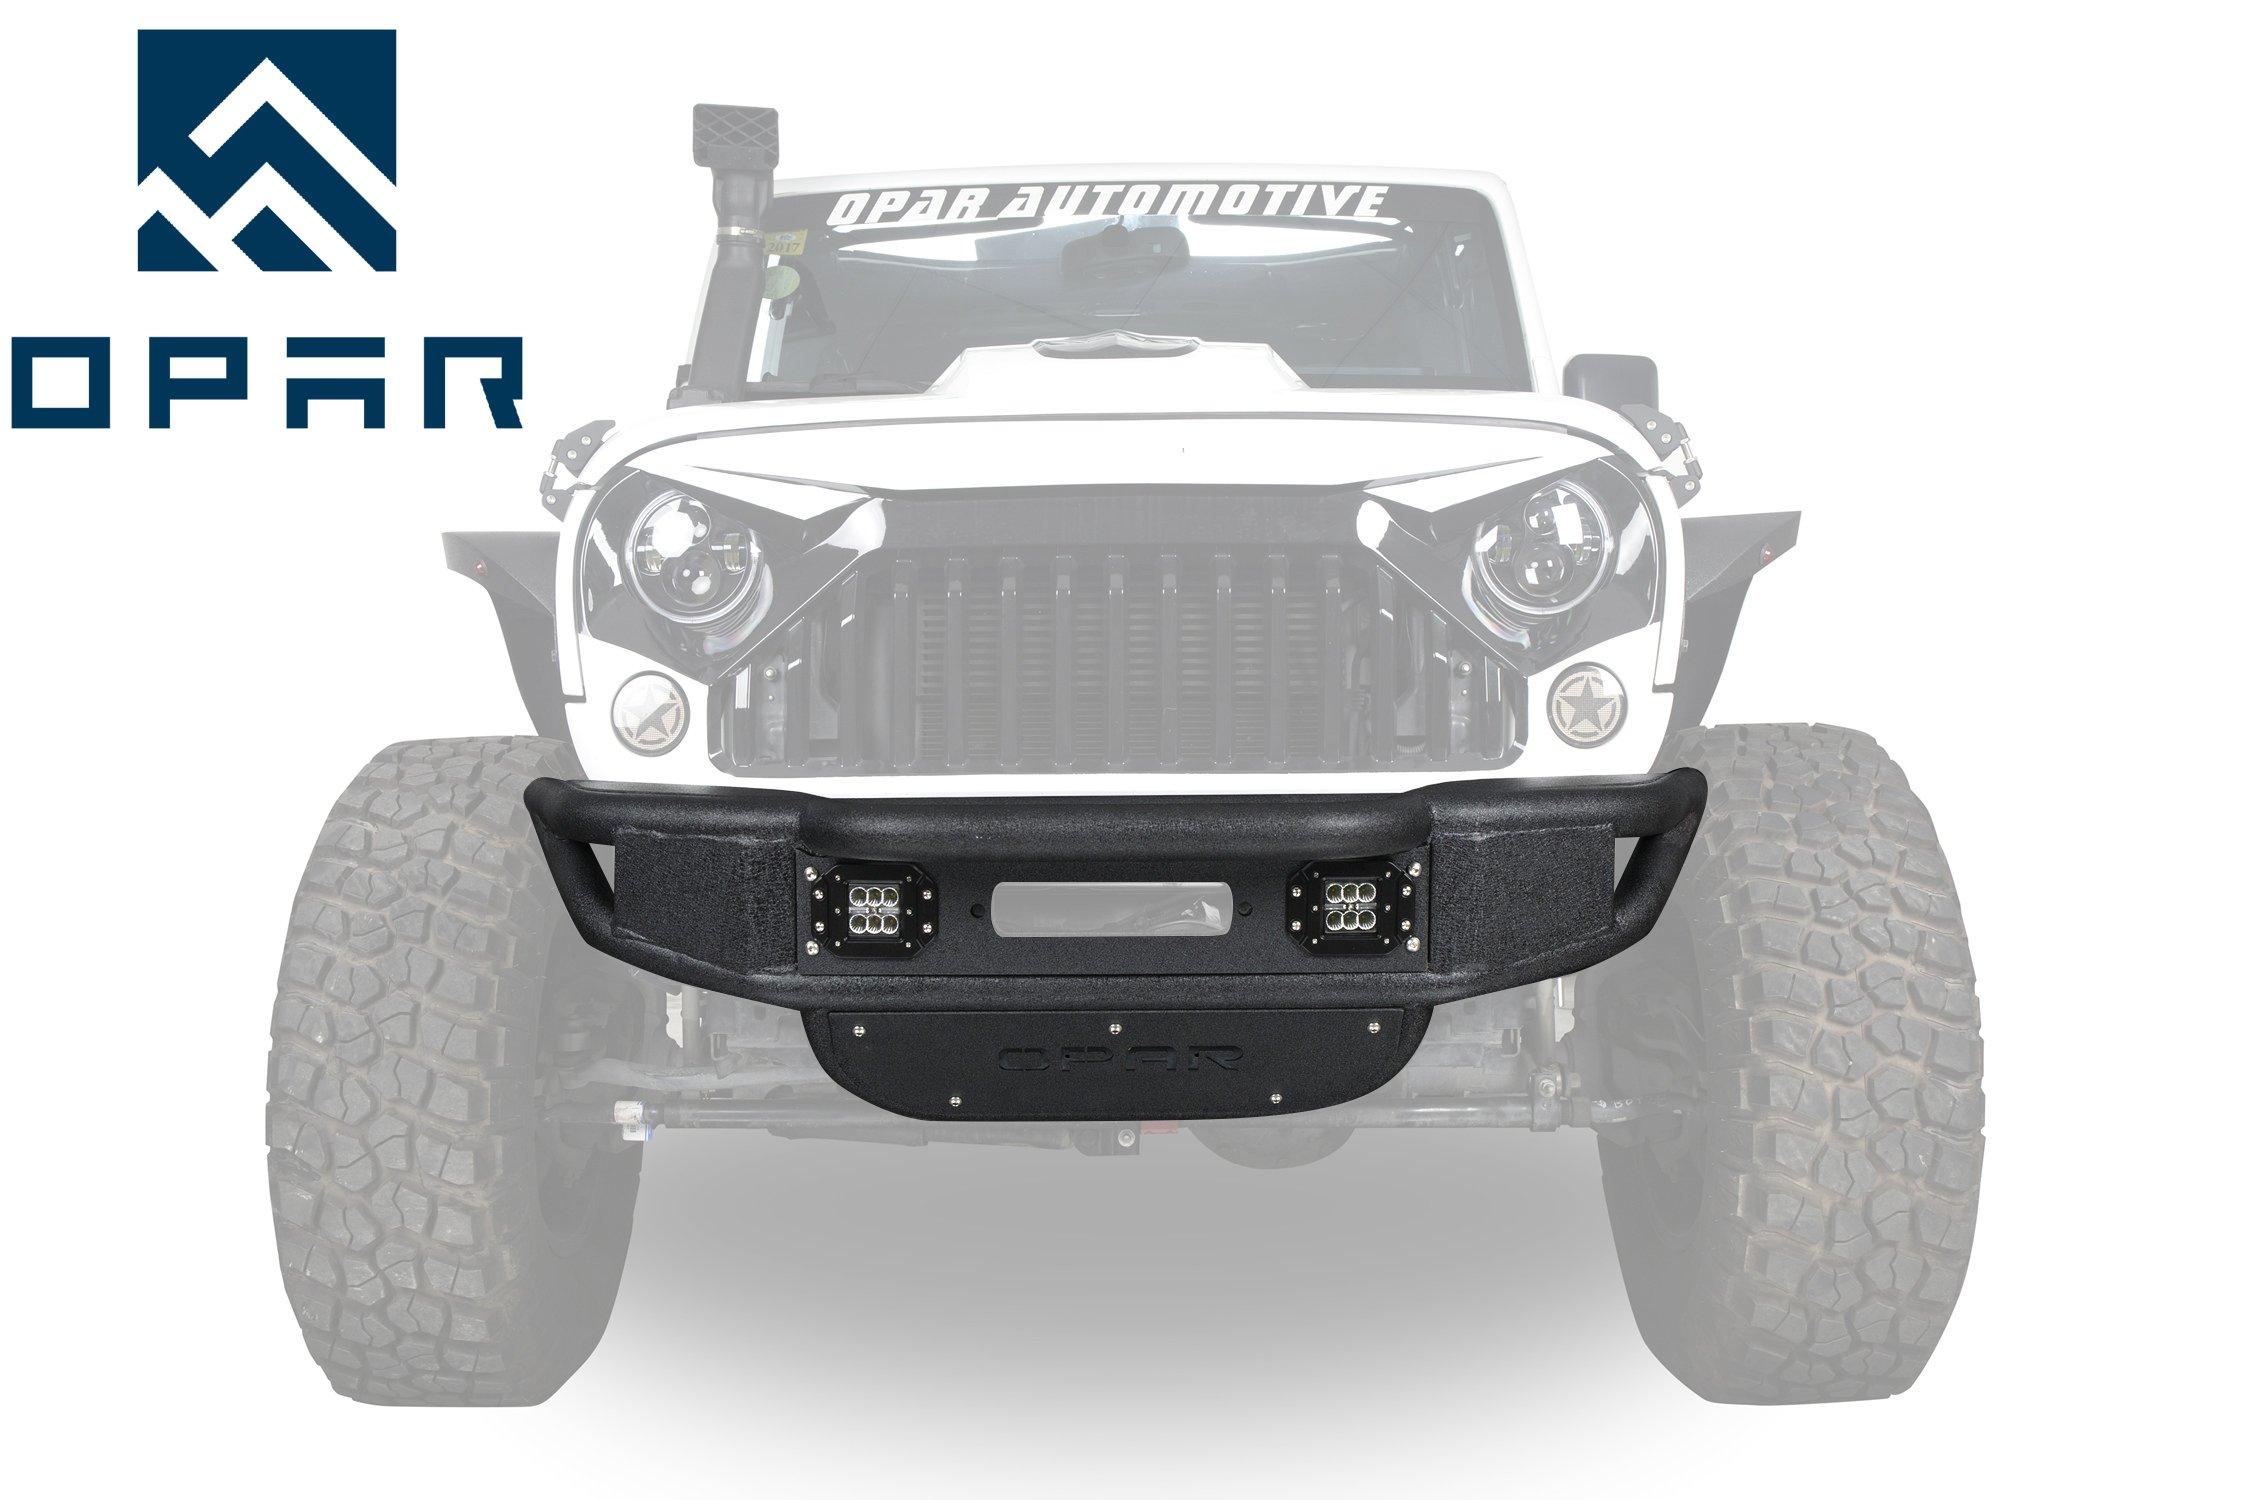 cd57316c4d Get Quotations · Opar Rock Crawler Tubular Front bumper w/Winch Plate & LED  Lights for 2007-